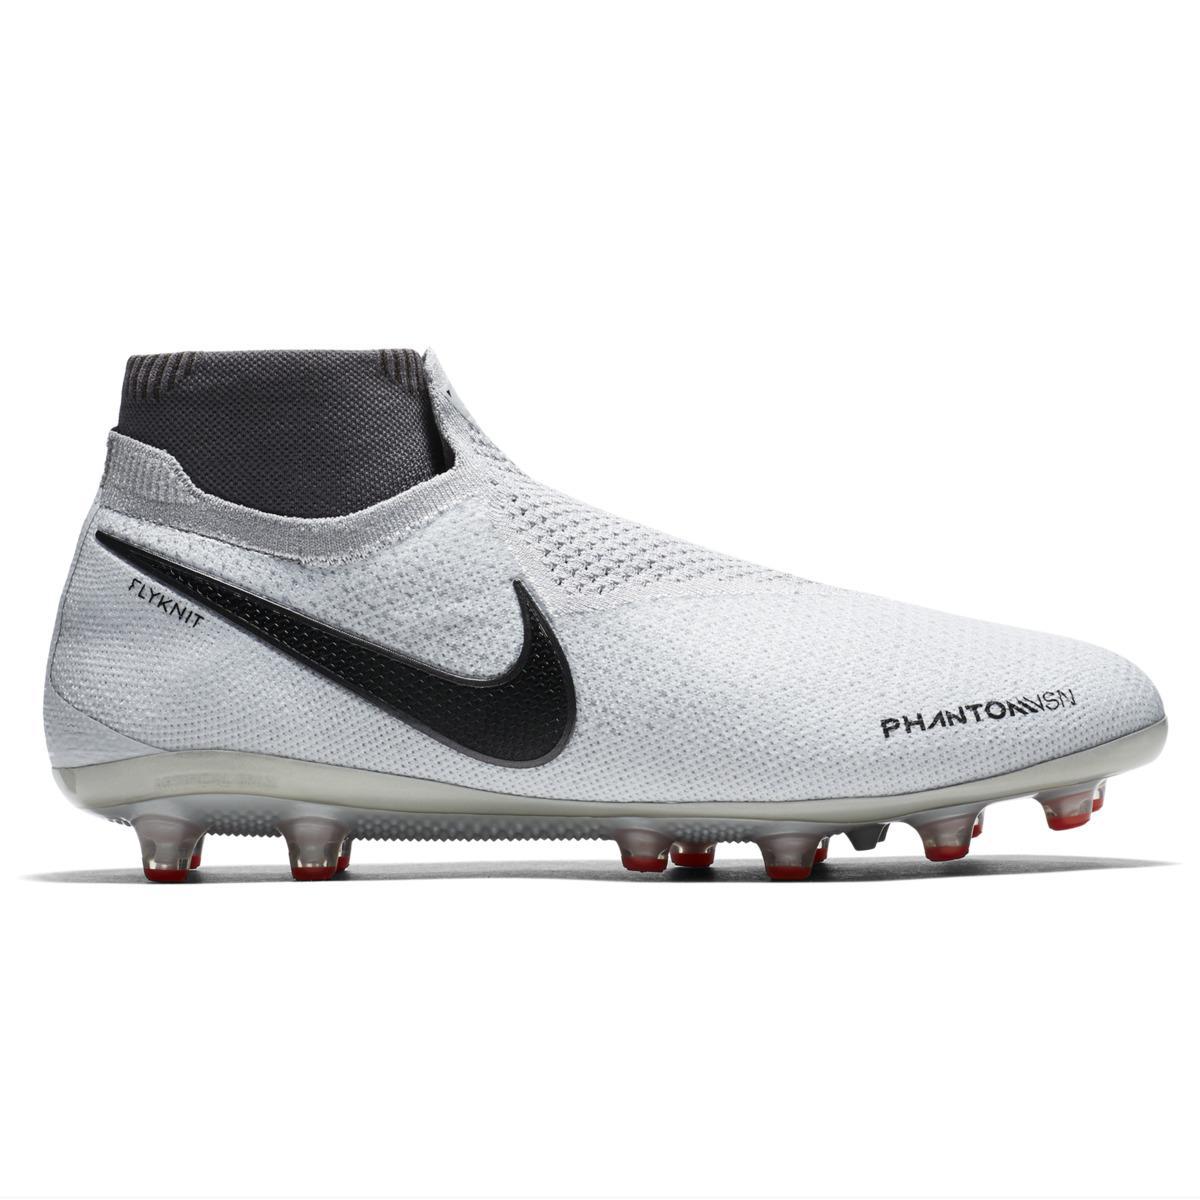 1c13c7aa8 Nike Phantom Vision Elite Dynamic Fit Ag-pro Football Boots for Men ...